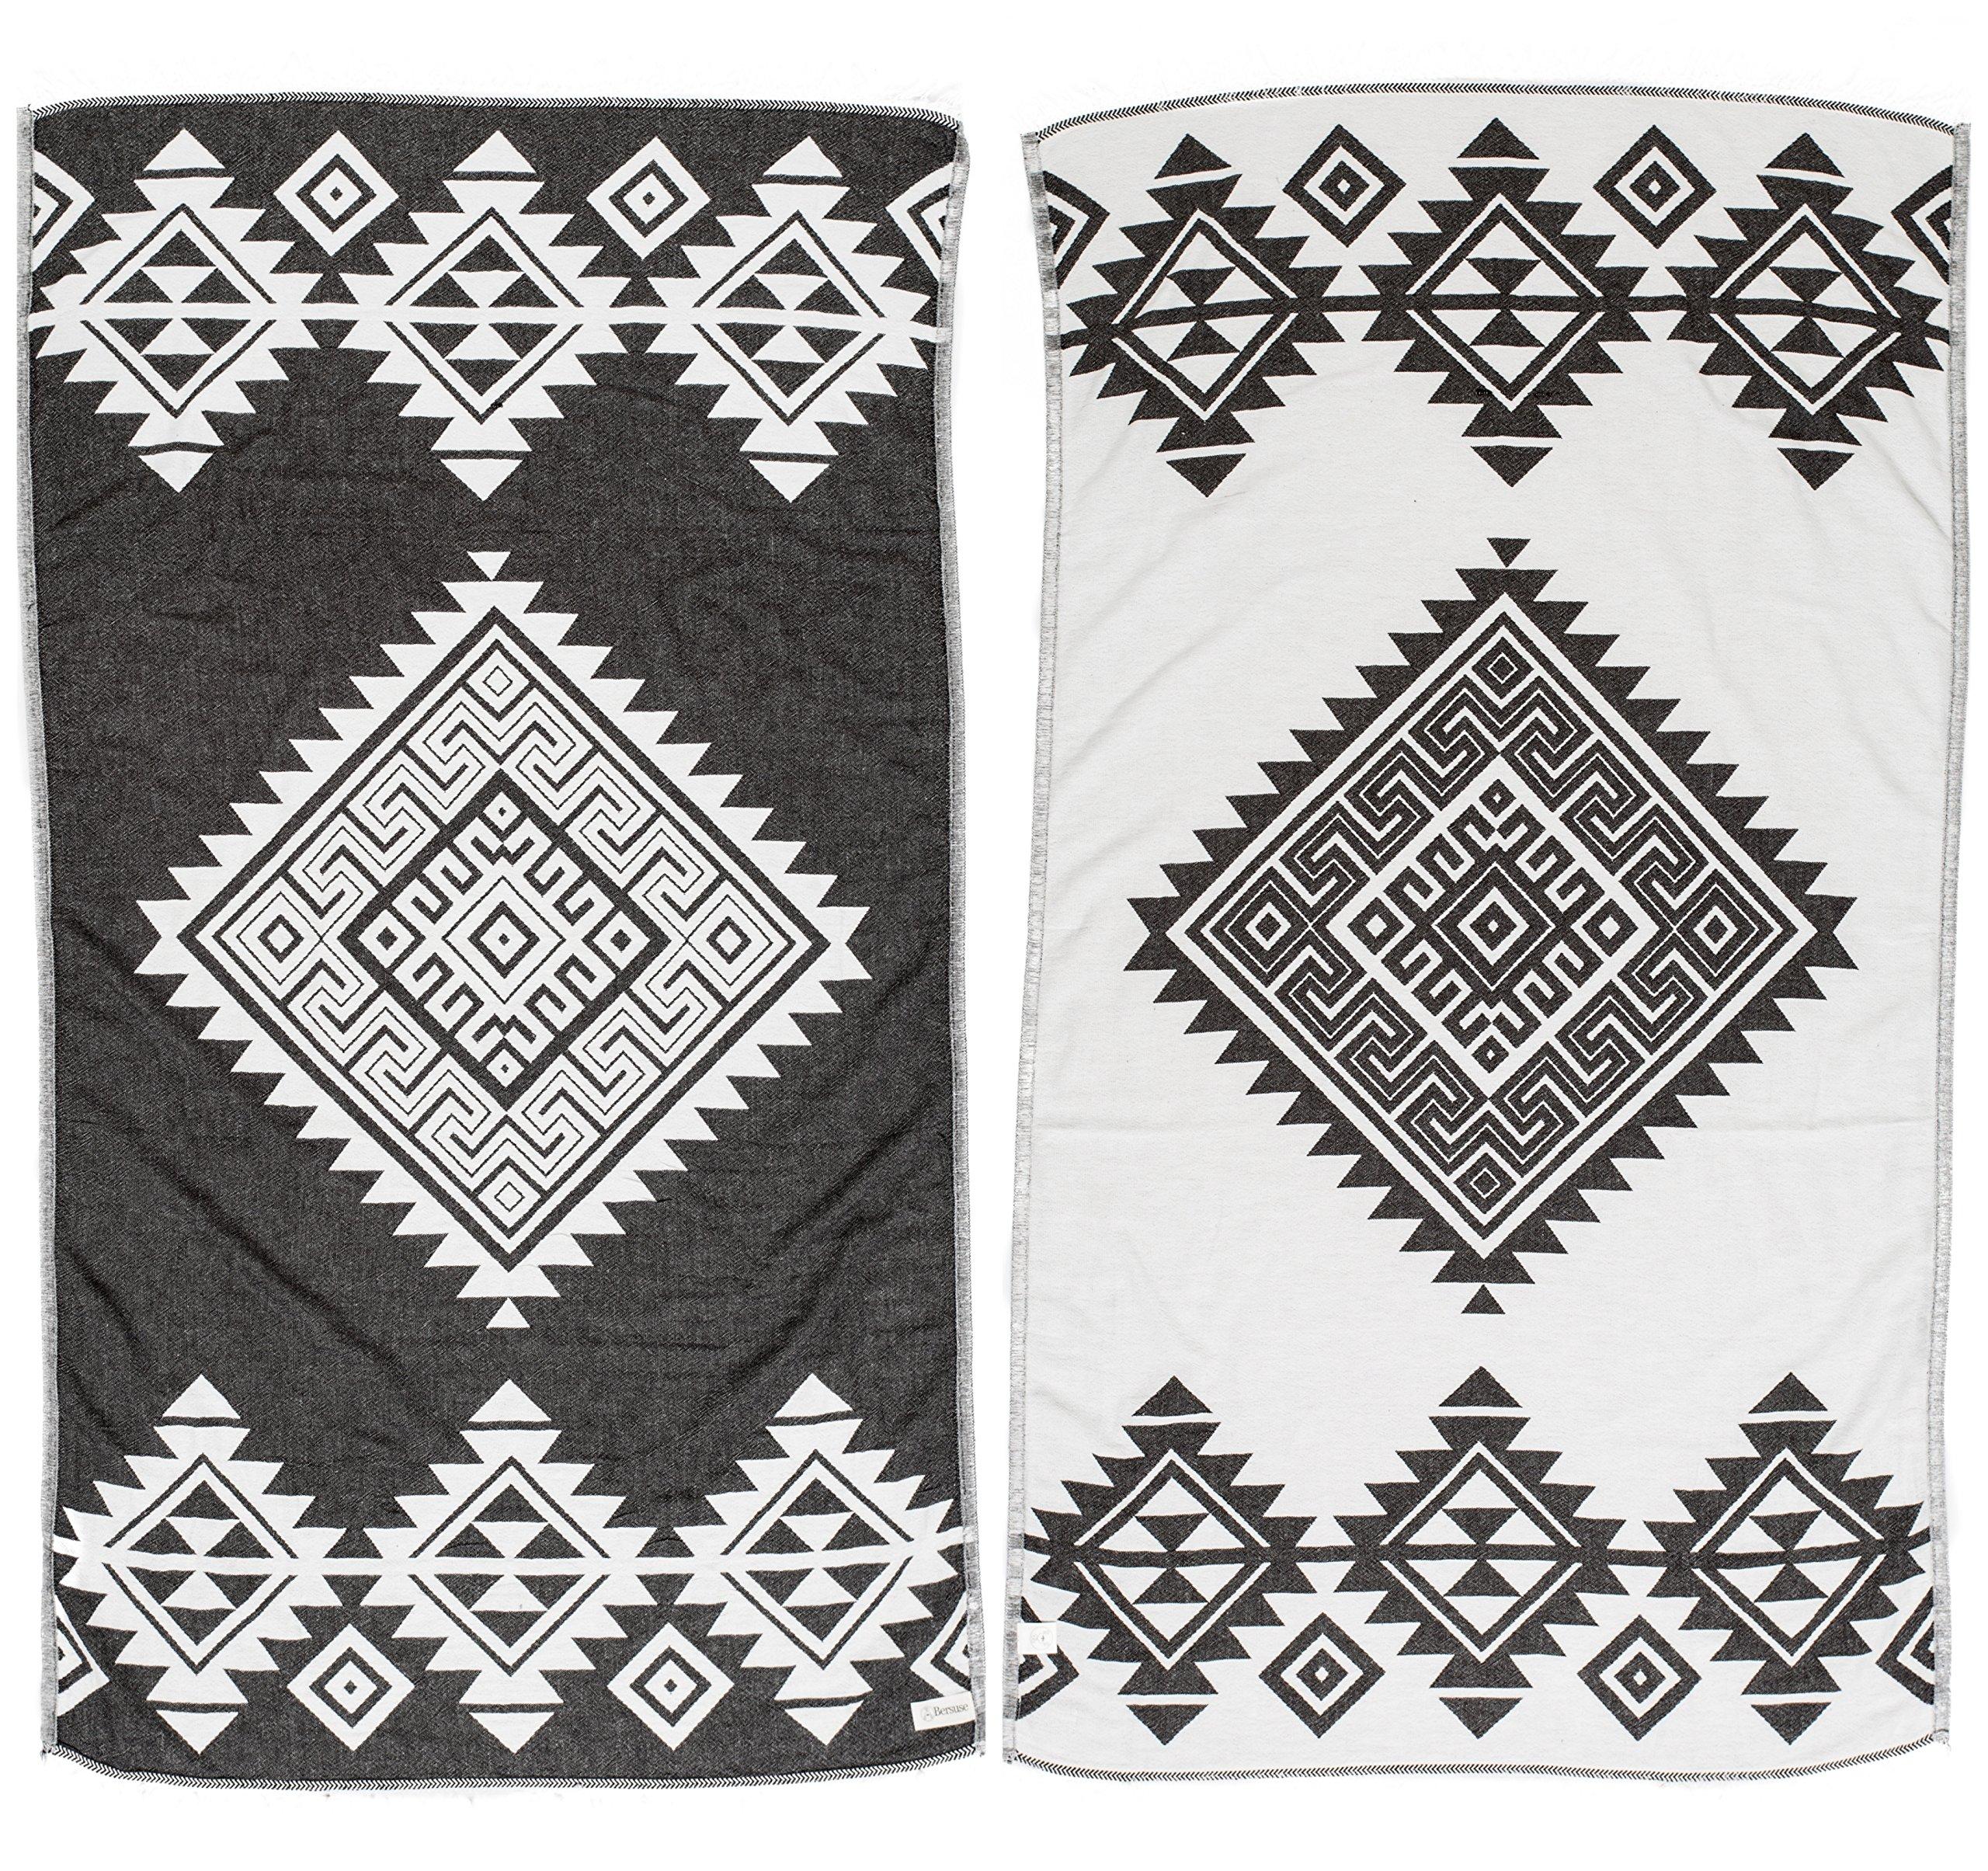 Bersuse 100% Cotton - Yucatan Turkish Towel - Bath Beach Fouta Peshtemal - Aztec Navajo Tribal Bohemian - Dual-Layer Handloom Pestemal - 39X71 Inches, Black (Set of 6)